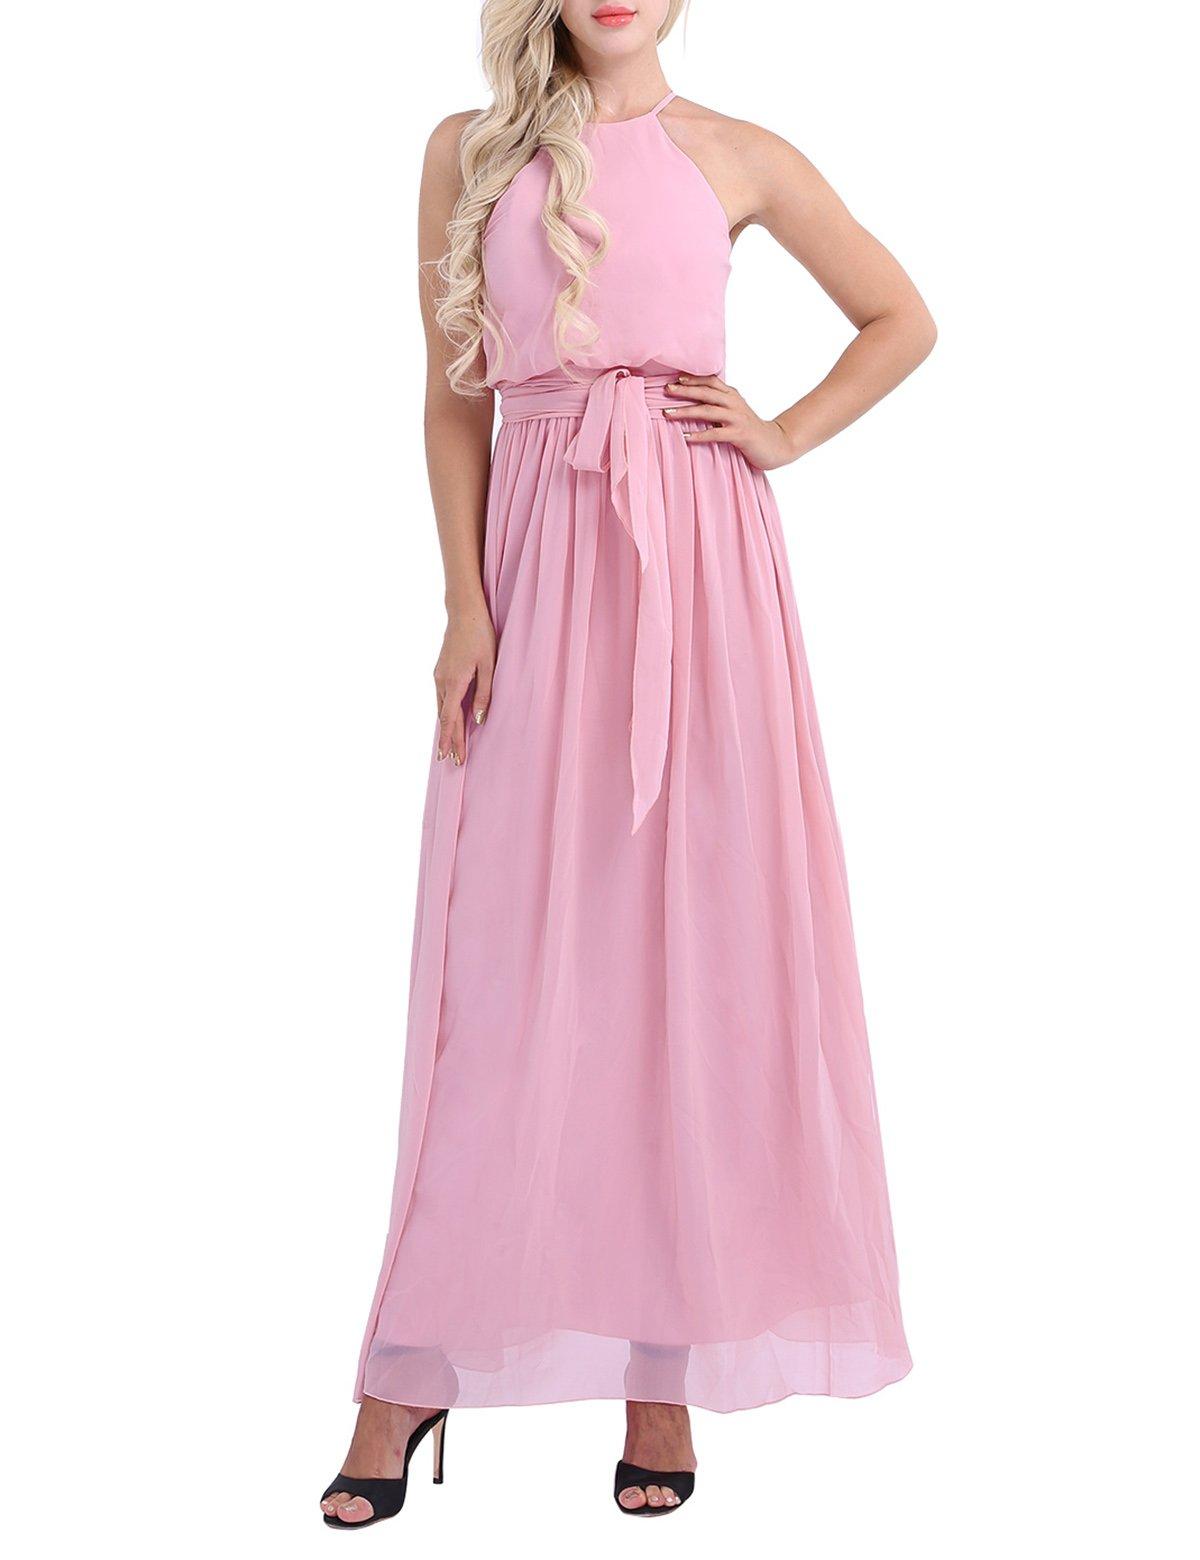 36496f05ab23 ... dresses/iiniim Women's Halter Chiffon Wedding Maxi Dress Evening Party Bridesmaid  Long Dresses Dusty Rose US Size 4. ; 